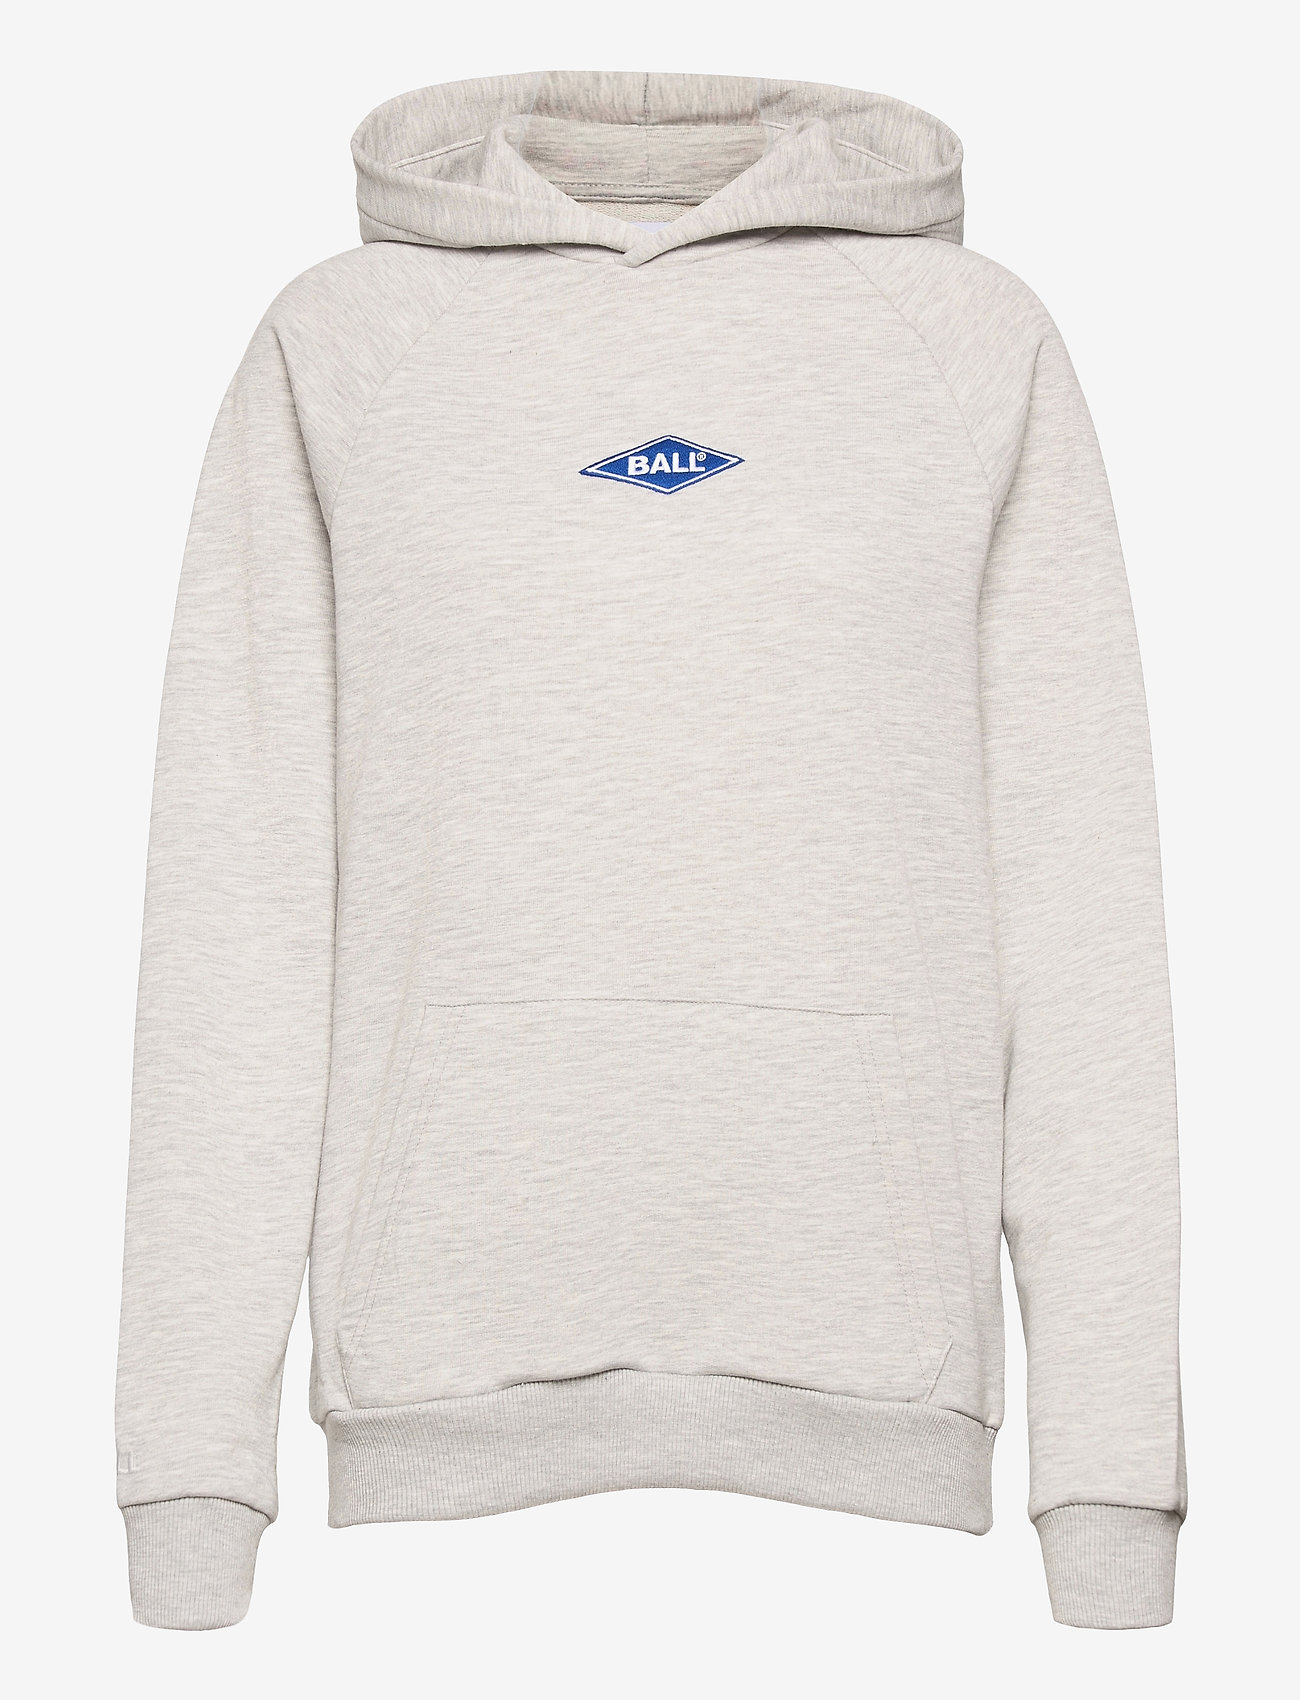 BALL - BALL RIMINI HOODIE - sweatshirts & hættetrøjer - lg melange - 0